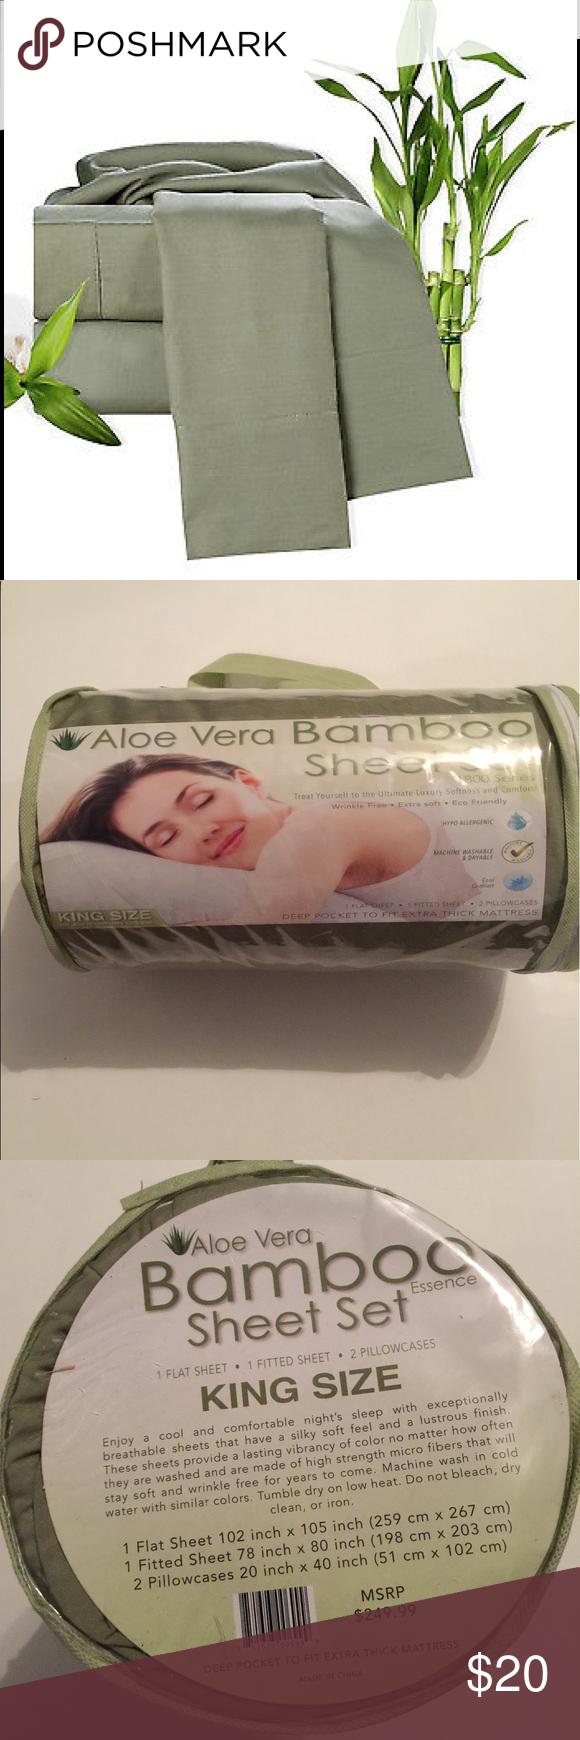 Aloe Vera Bamboo Sheet Set King Size Boutique My Posh Closet